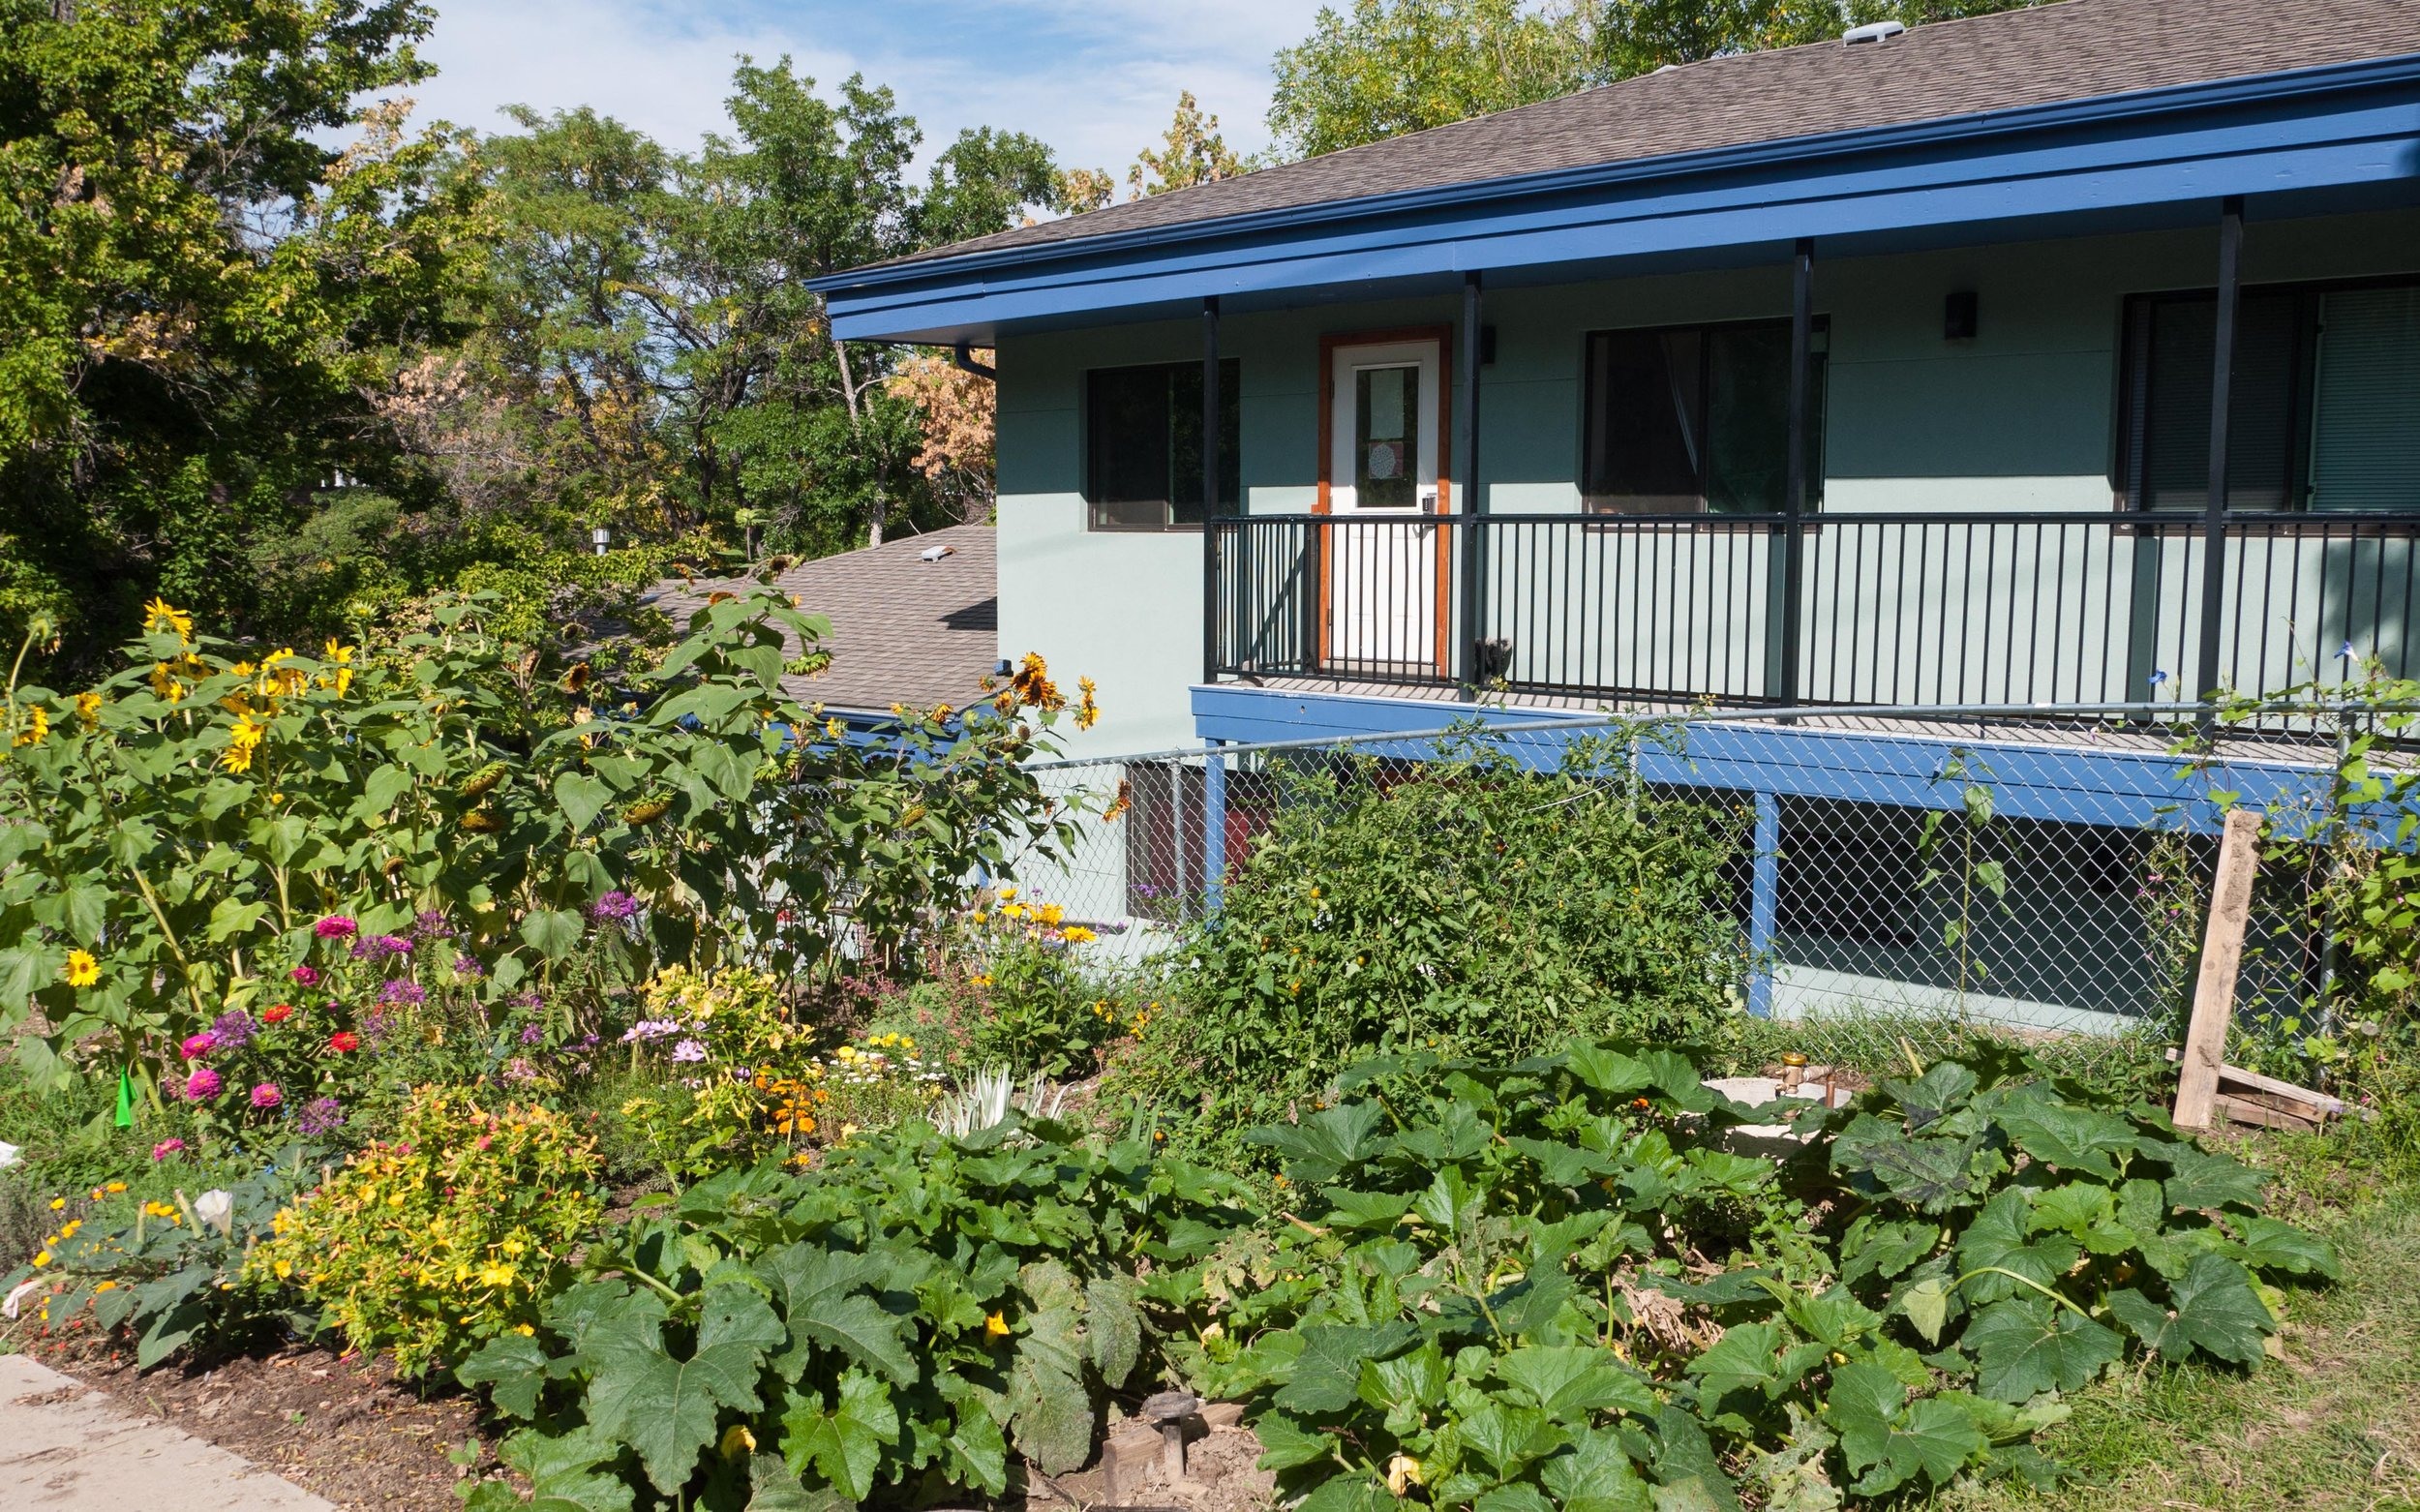 Ostara Cooperative Vegetable Garden. Credit: Boulder Housing Coalition